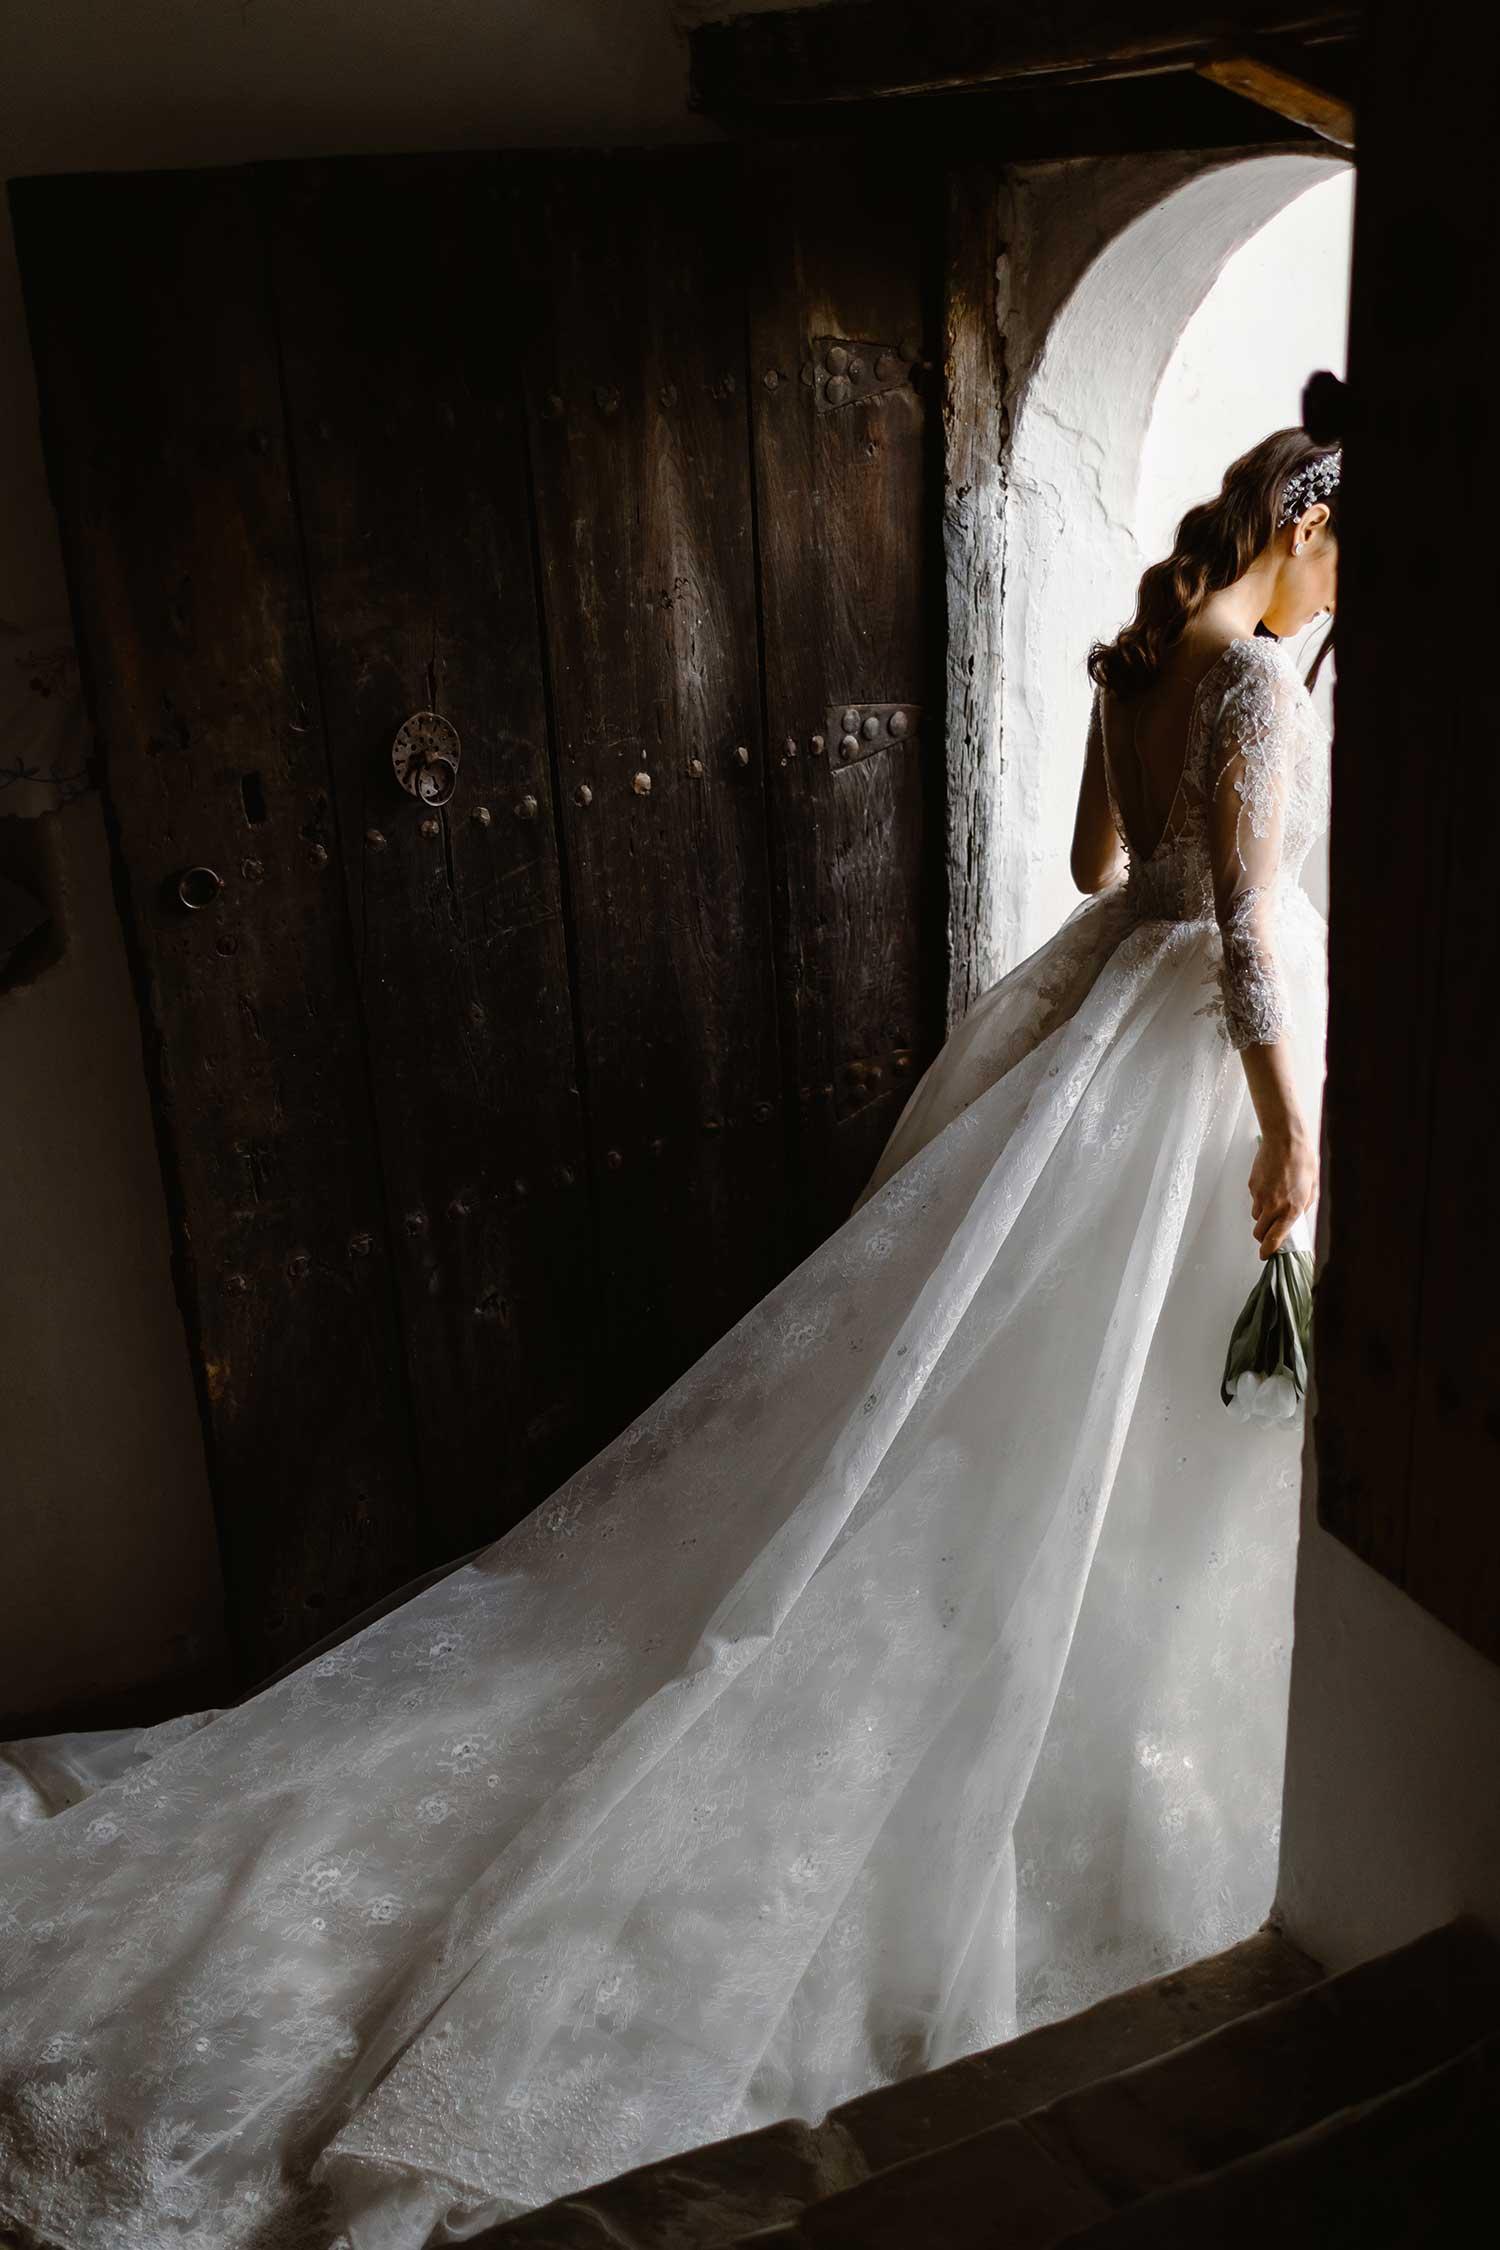 The beautiful bride leaving the house in Gjirokaster